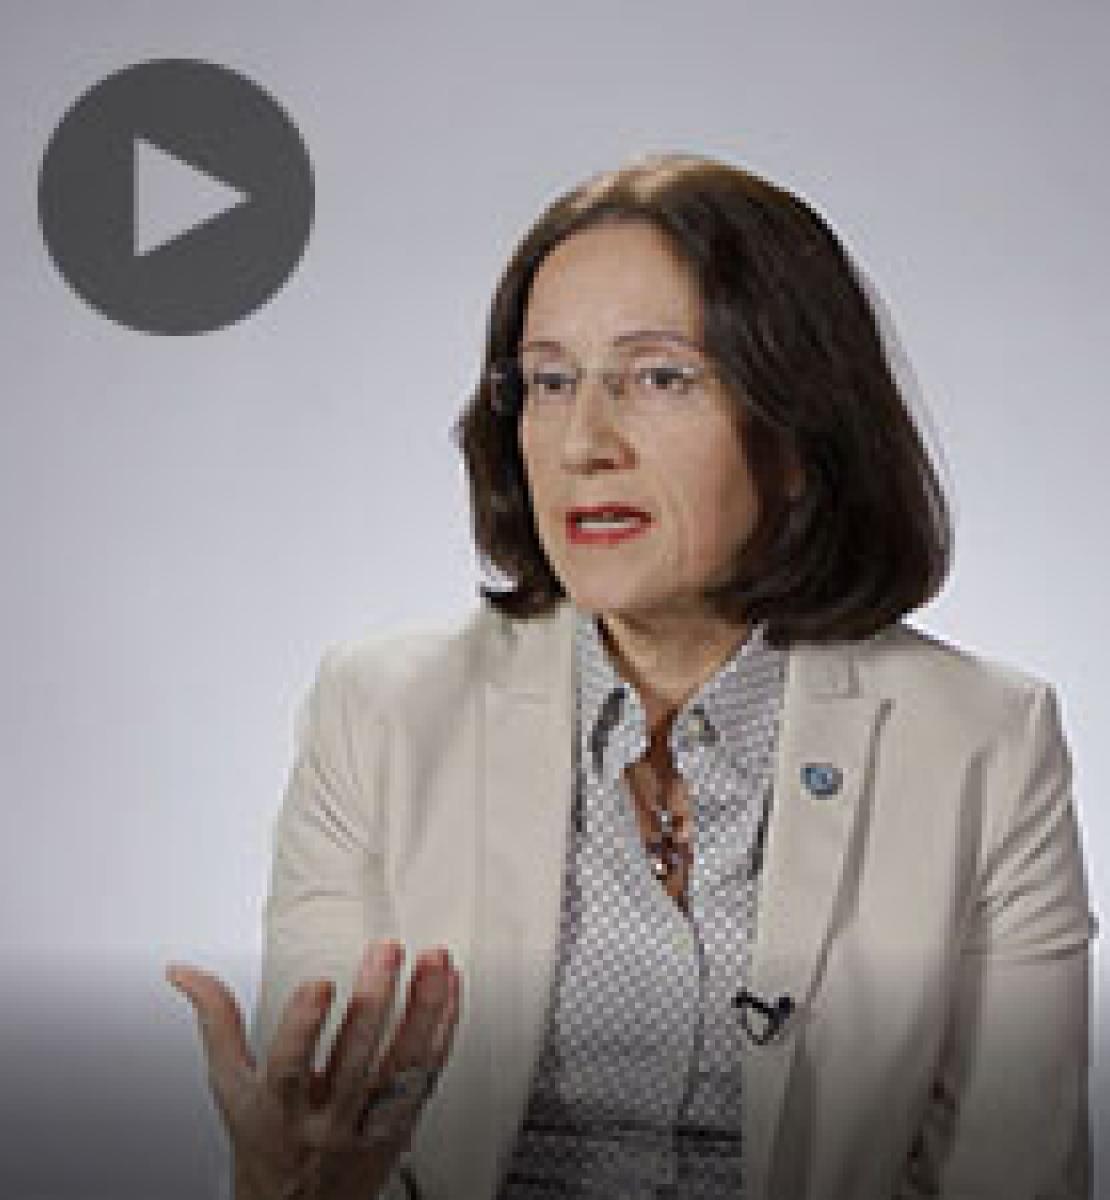 Screenshot from video message shows Resident Coordinator, Marina Walter